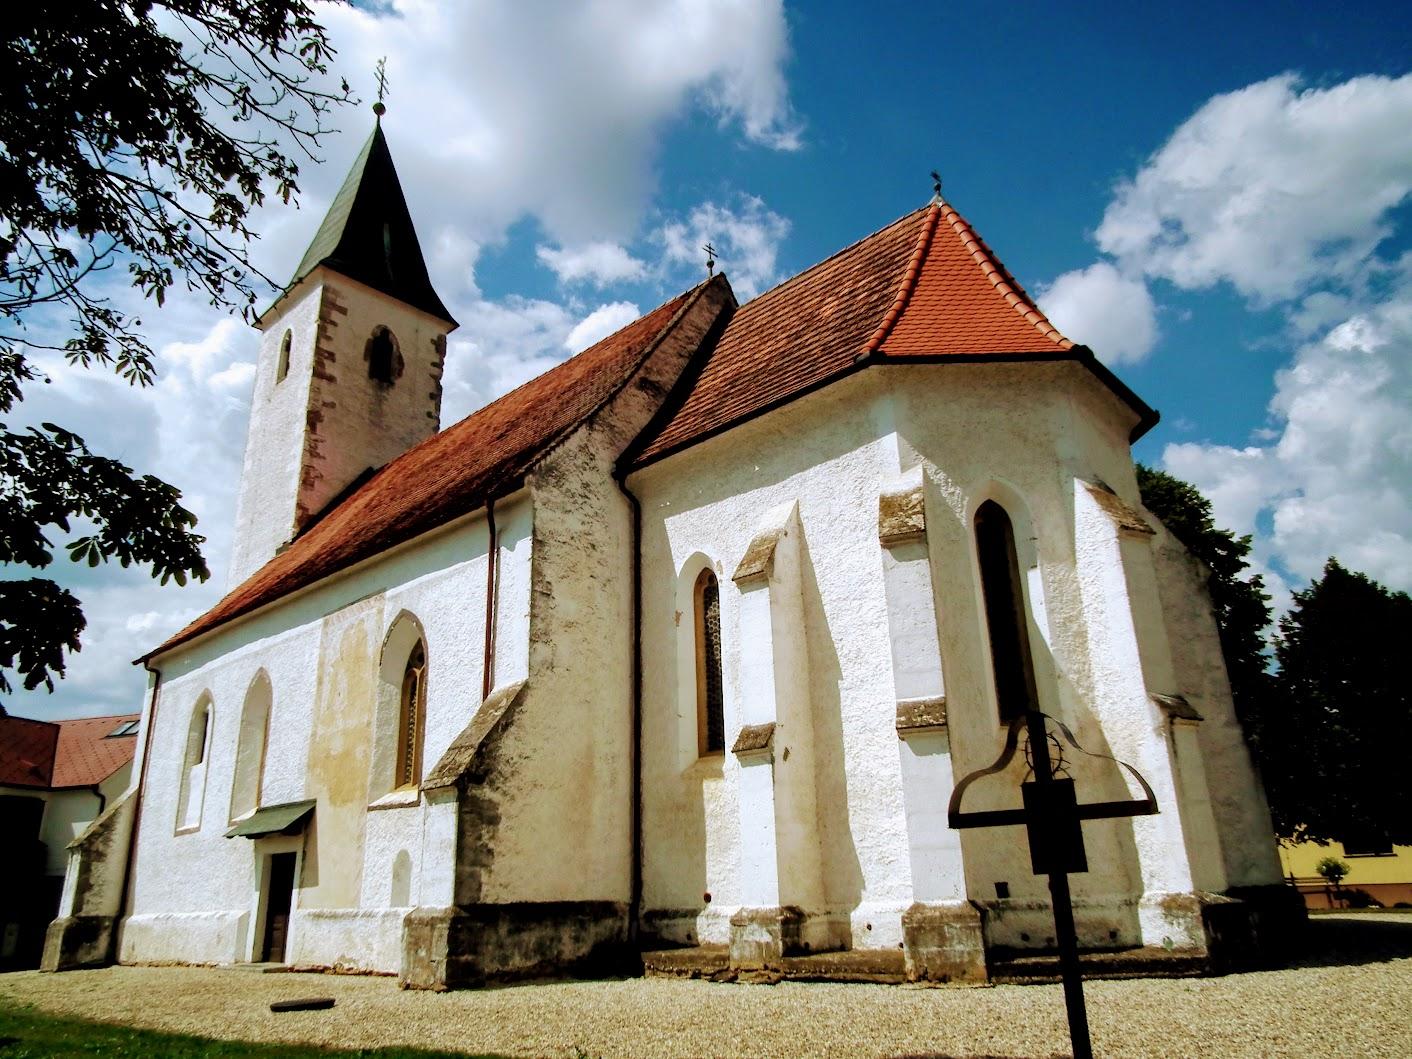 Martjanci (Mártonhely) - cerkev sv. Martina (Szent Márton rk. templom)